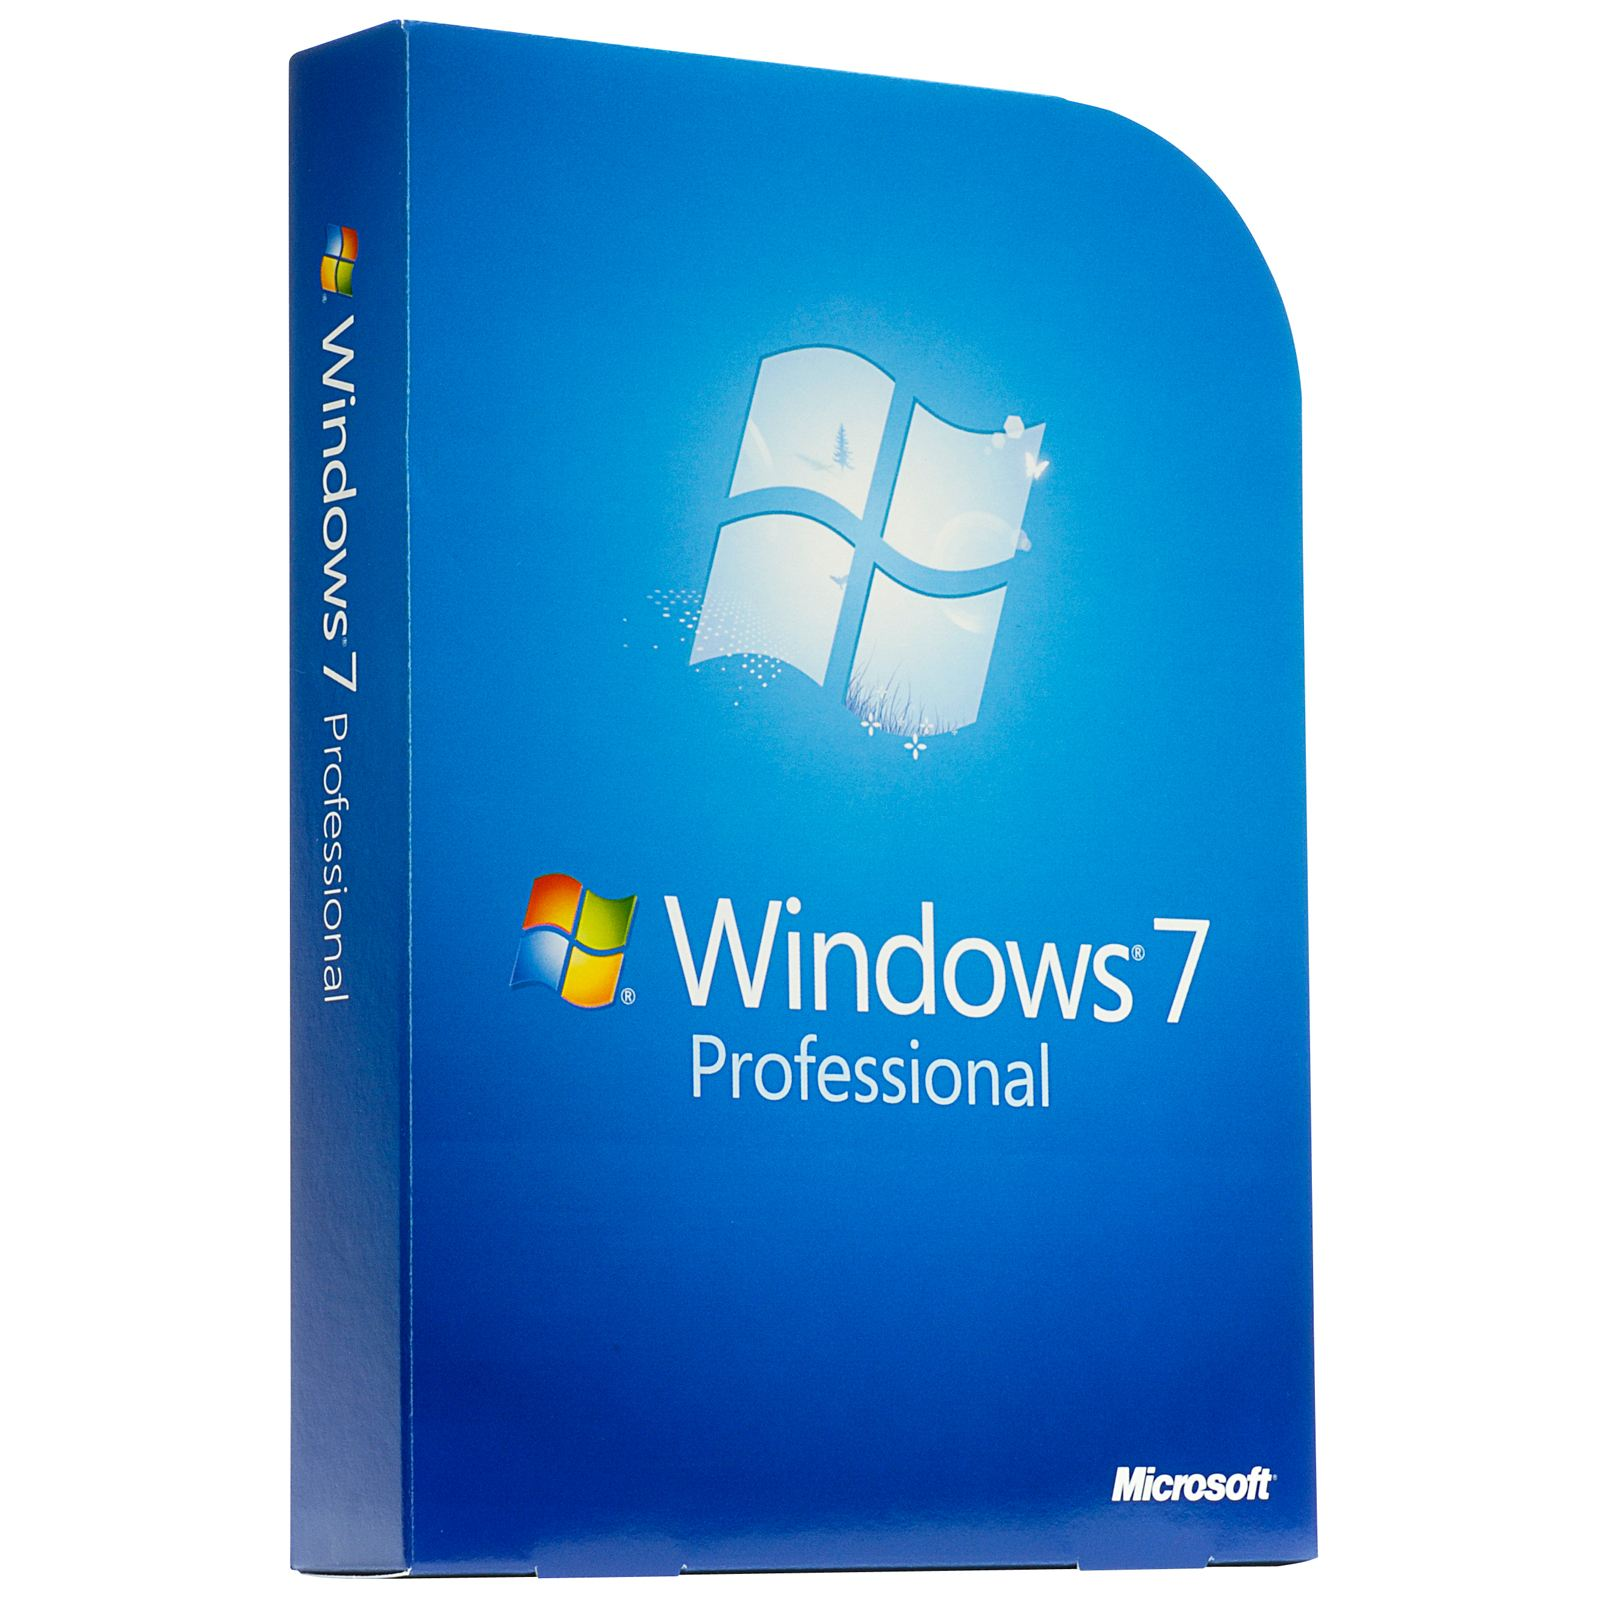 windows 7 professional 32 bit free download